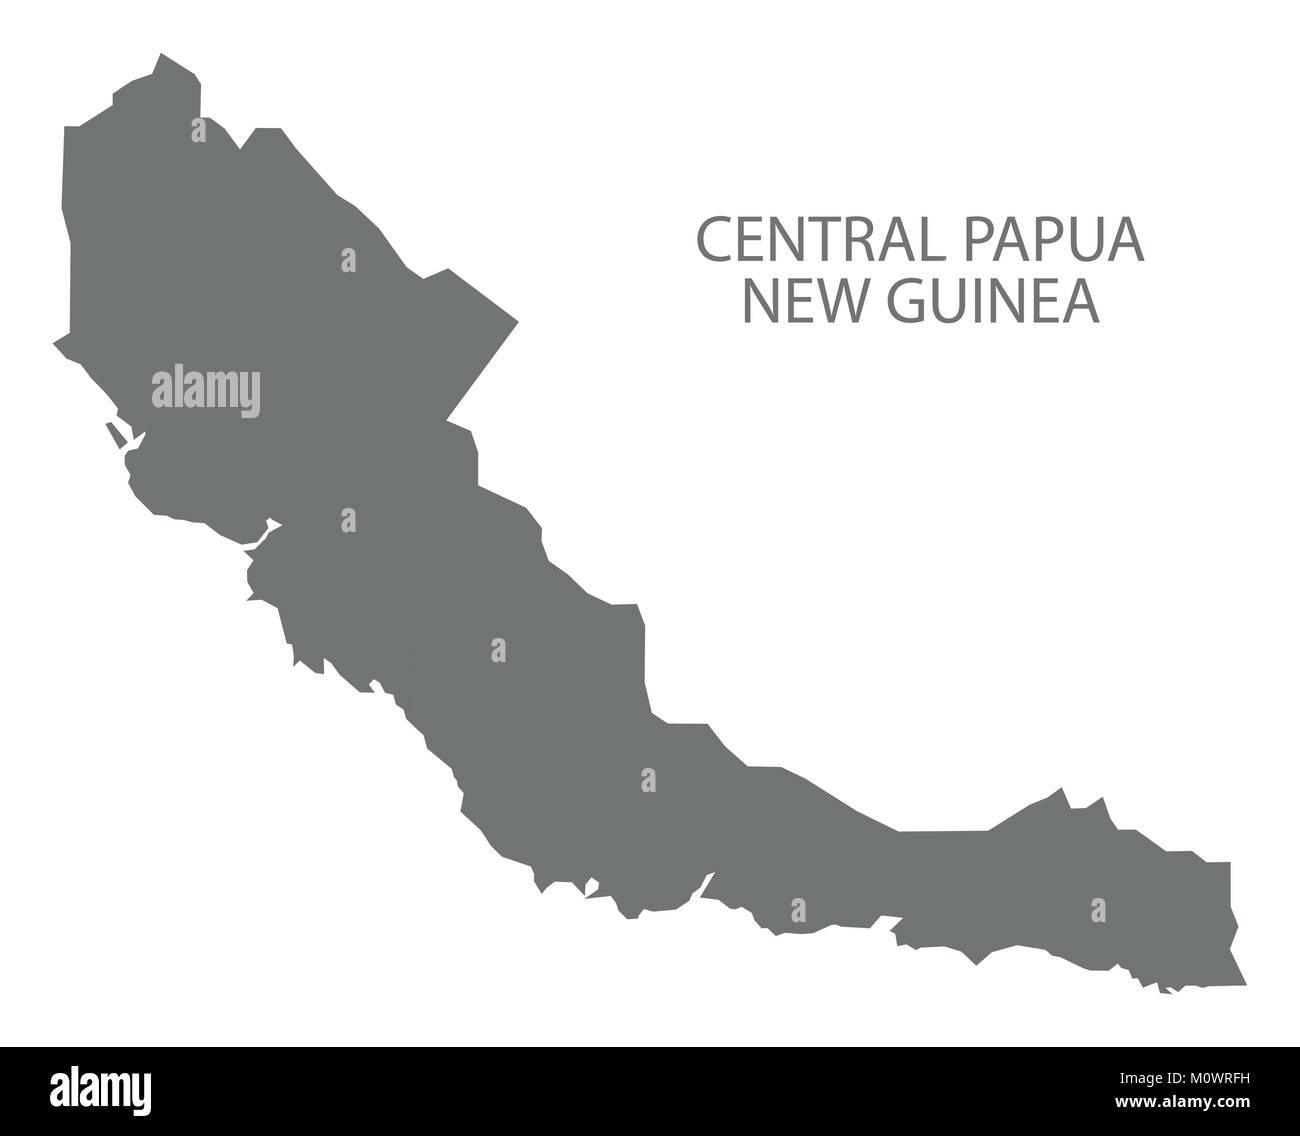 Central Papua New Guinea Stock Photos & Central Papua New